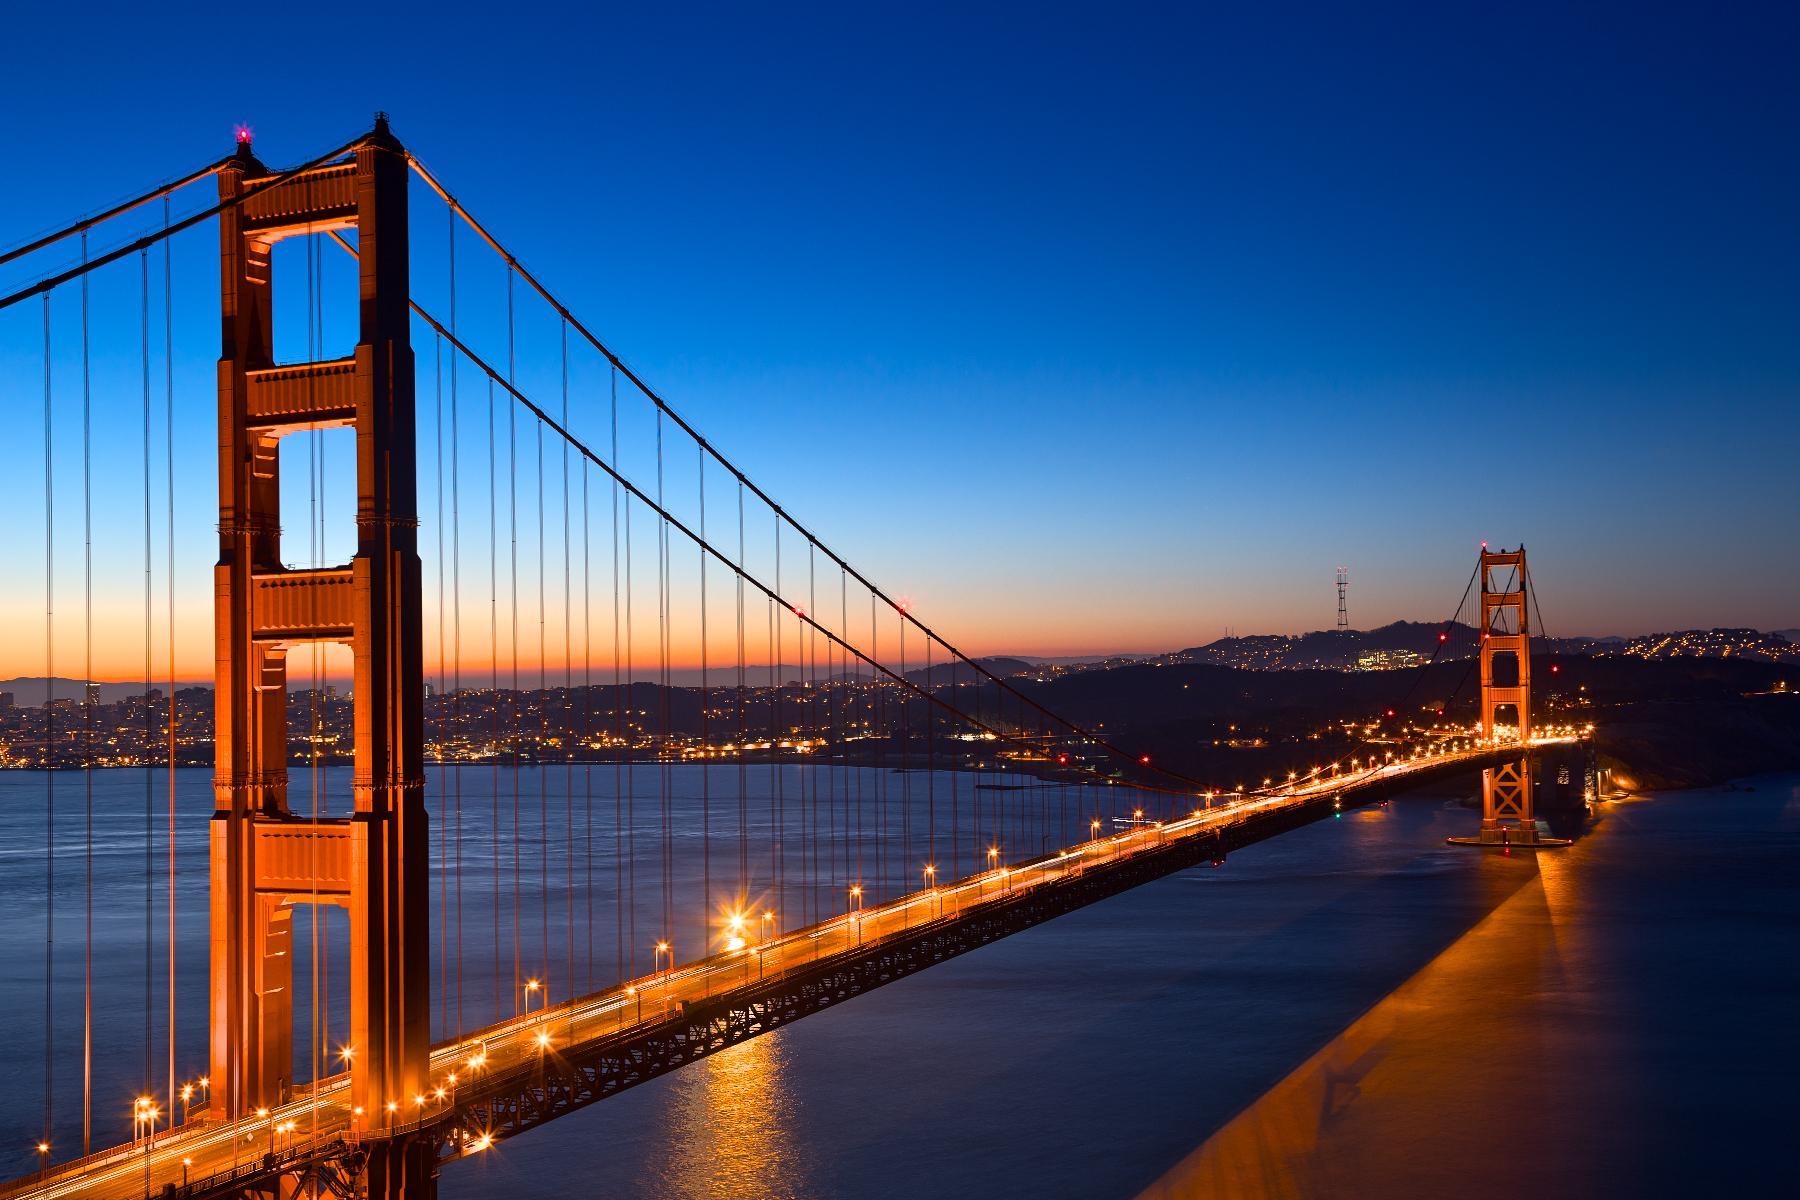 Golden Dawn Bridge - HDR, America, Resource, Sky, Sf, HQ Photo